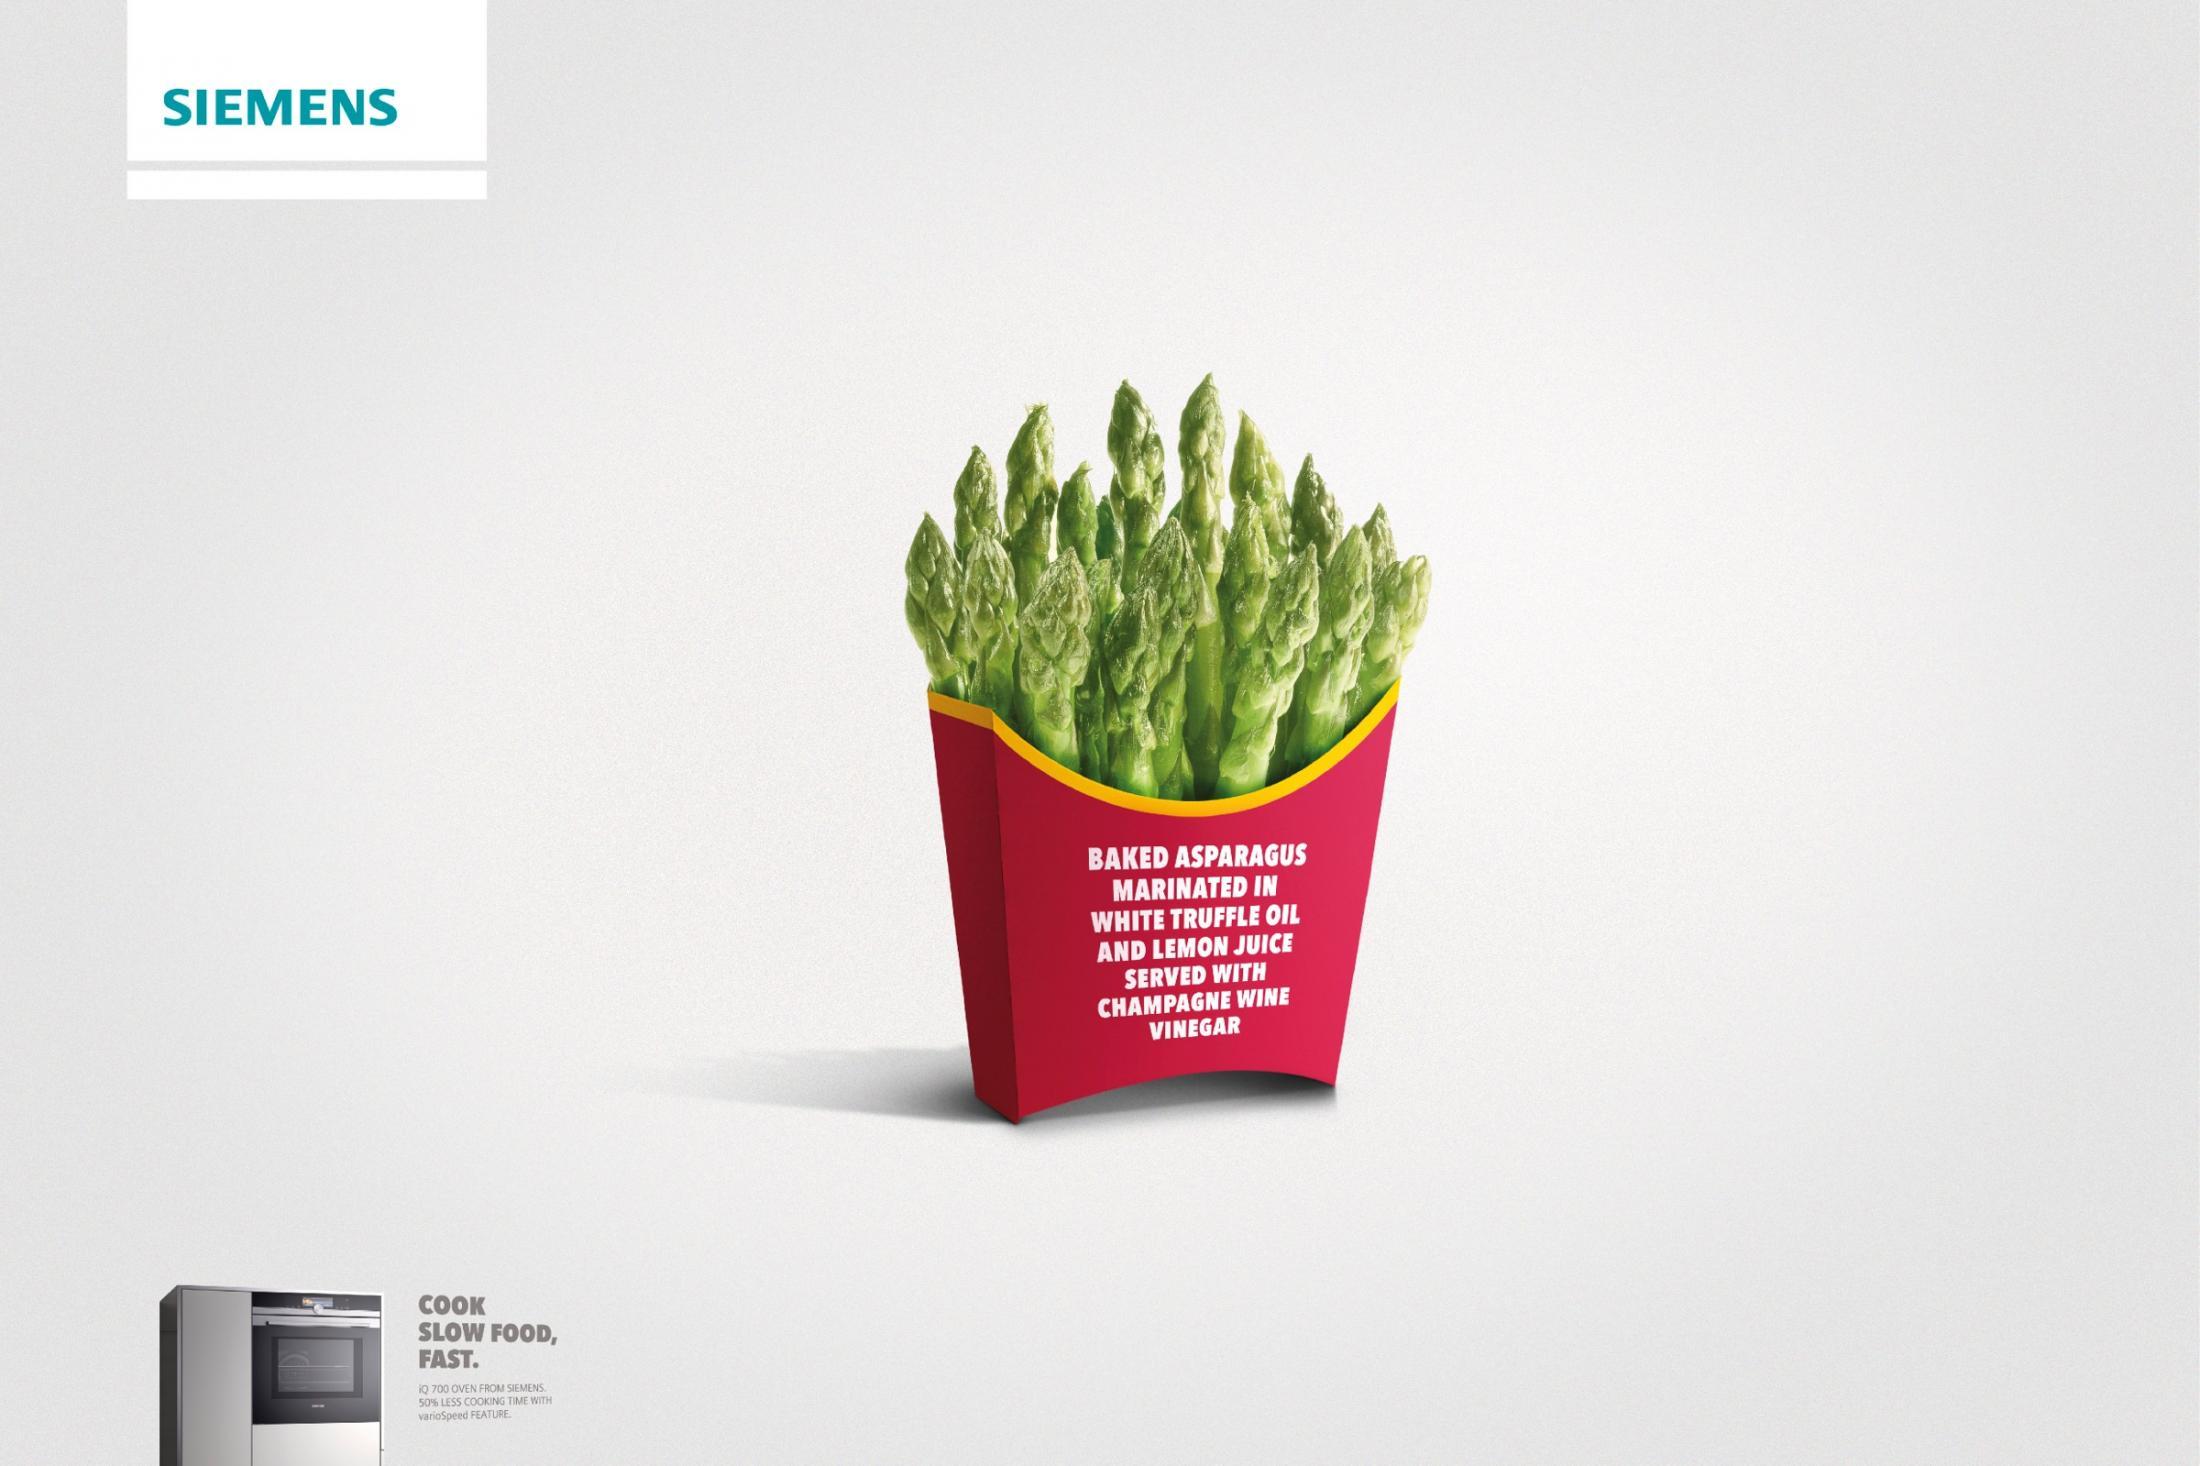 Siemens Print Ad -  Fast food - asparagus